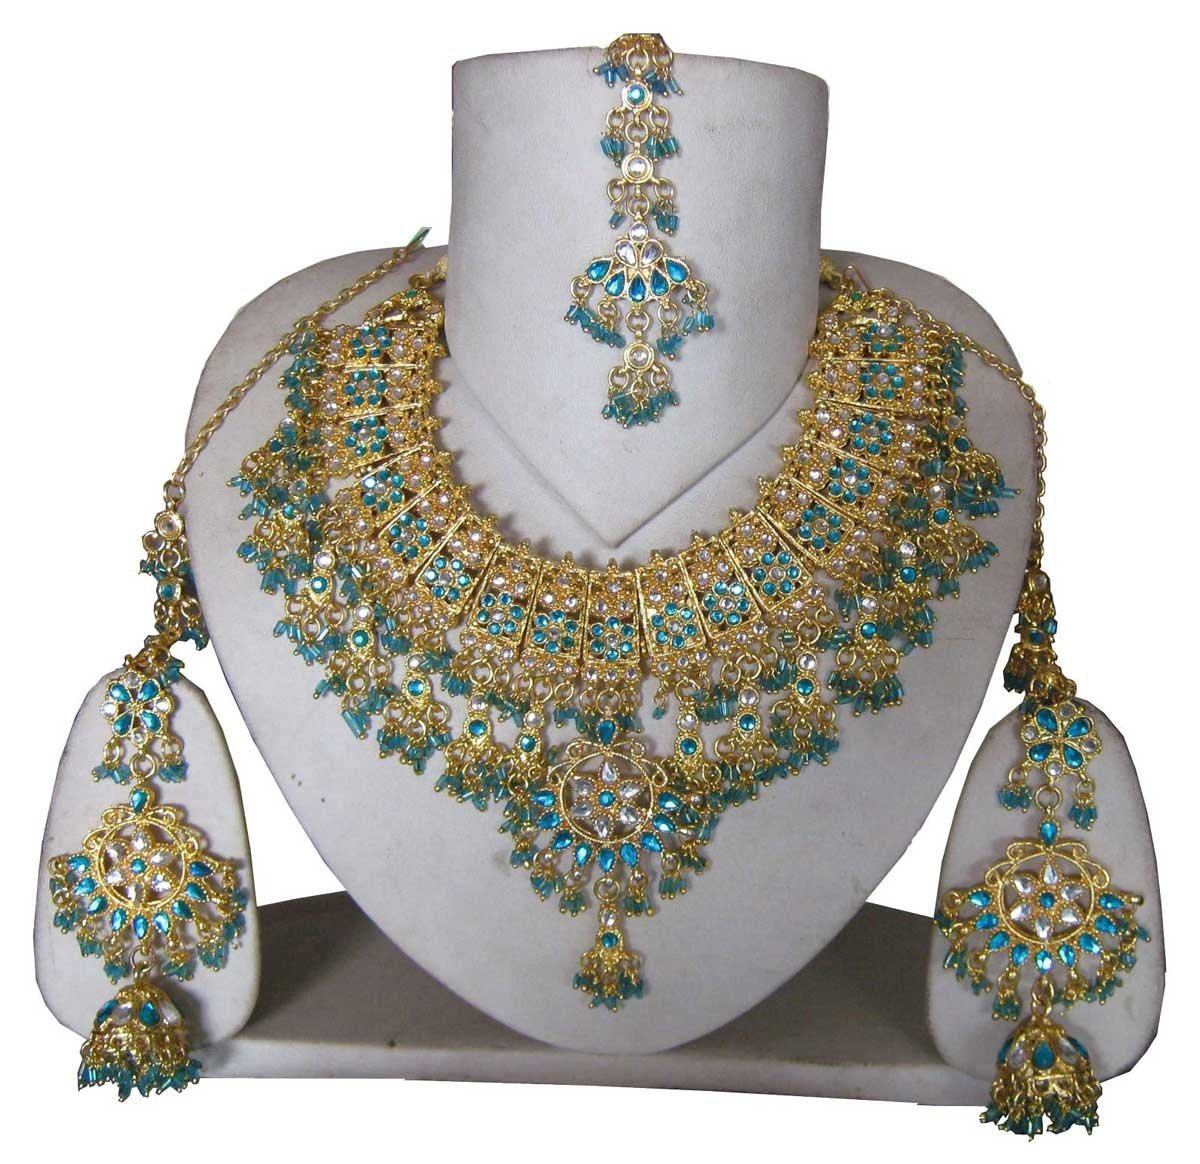 Imitation Jewellery World: Fashion Jewellery